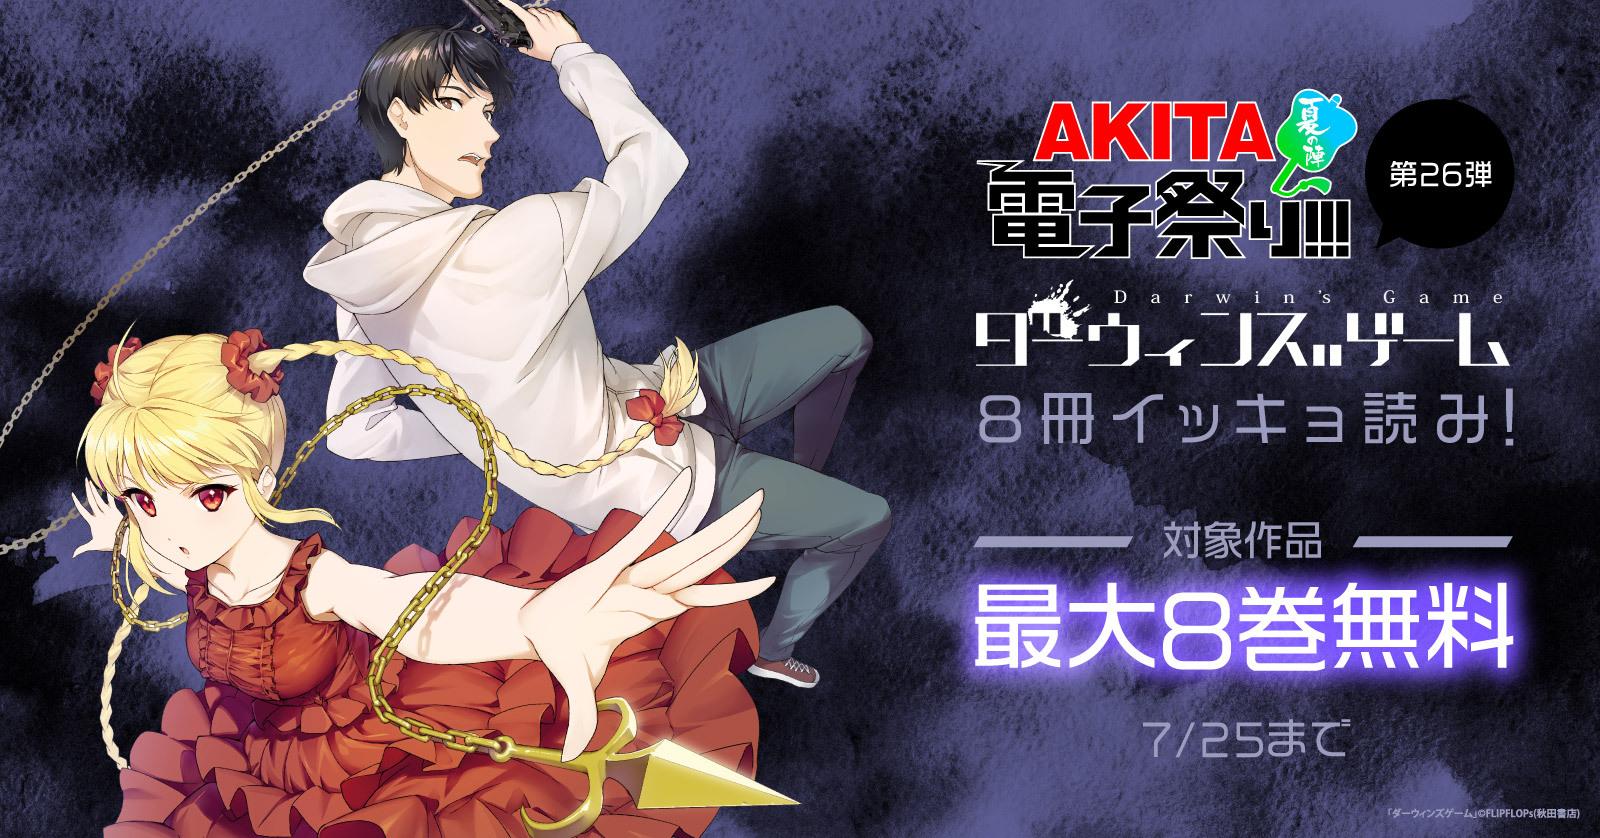 【AKITA電子祭り 夏の陣】第26弾 ダーウィンズゲーム8冊イッキョ読み!